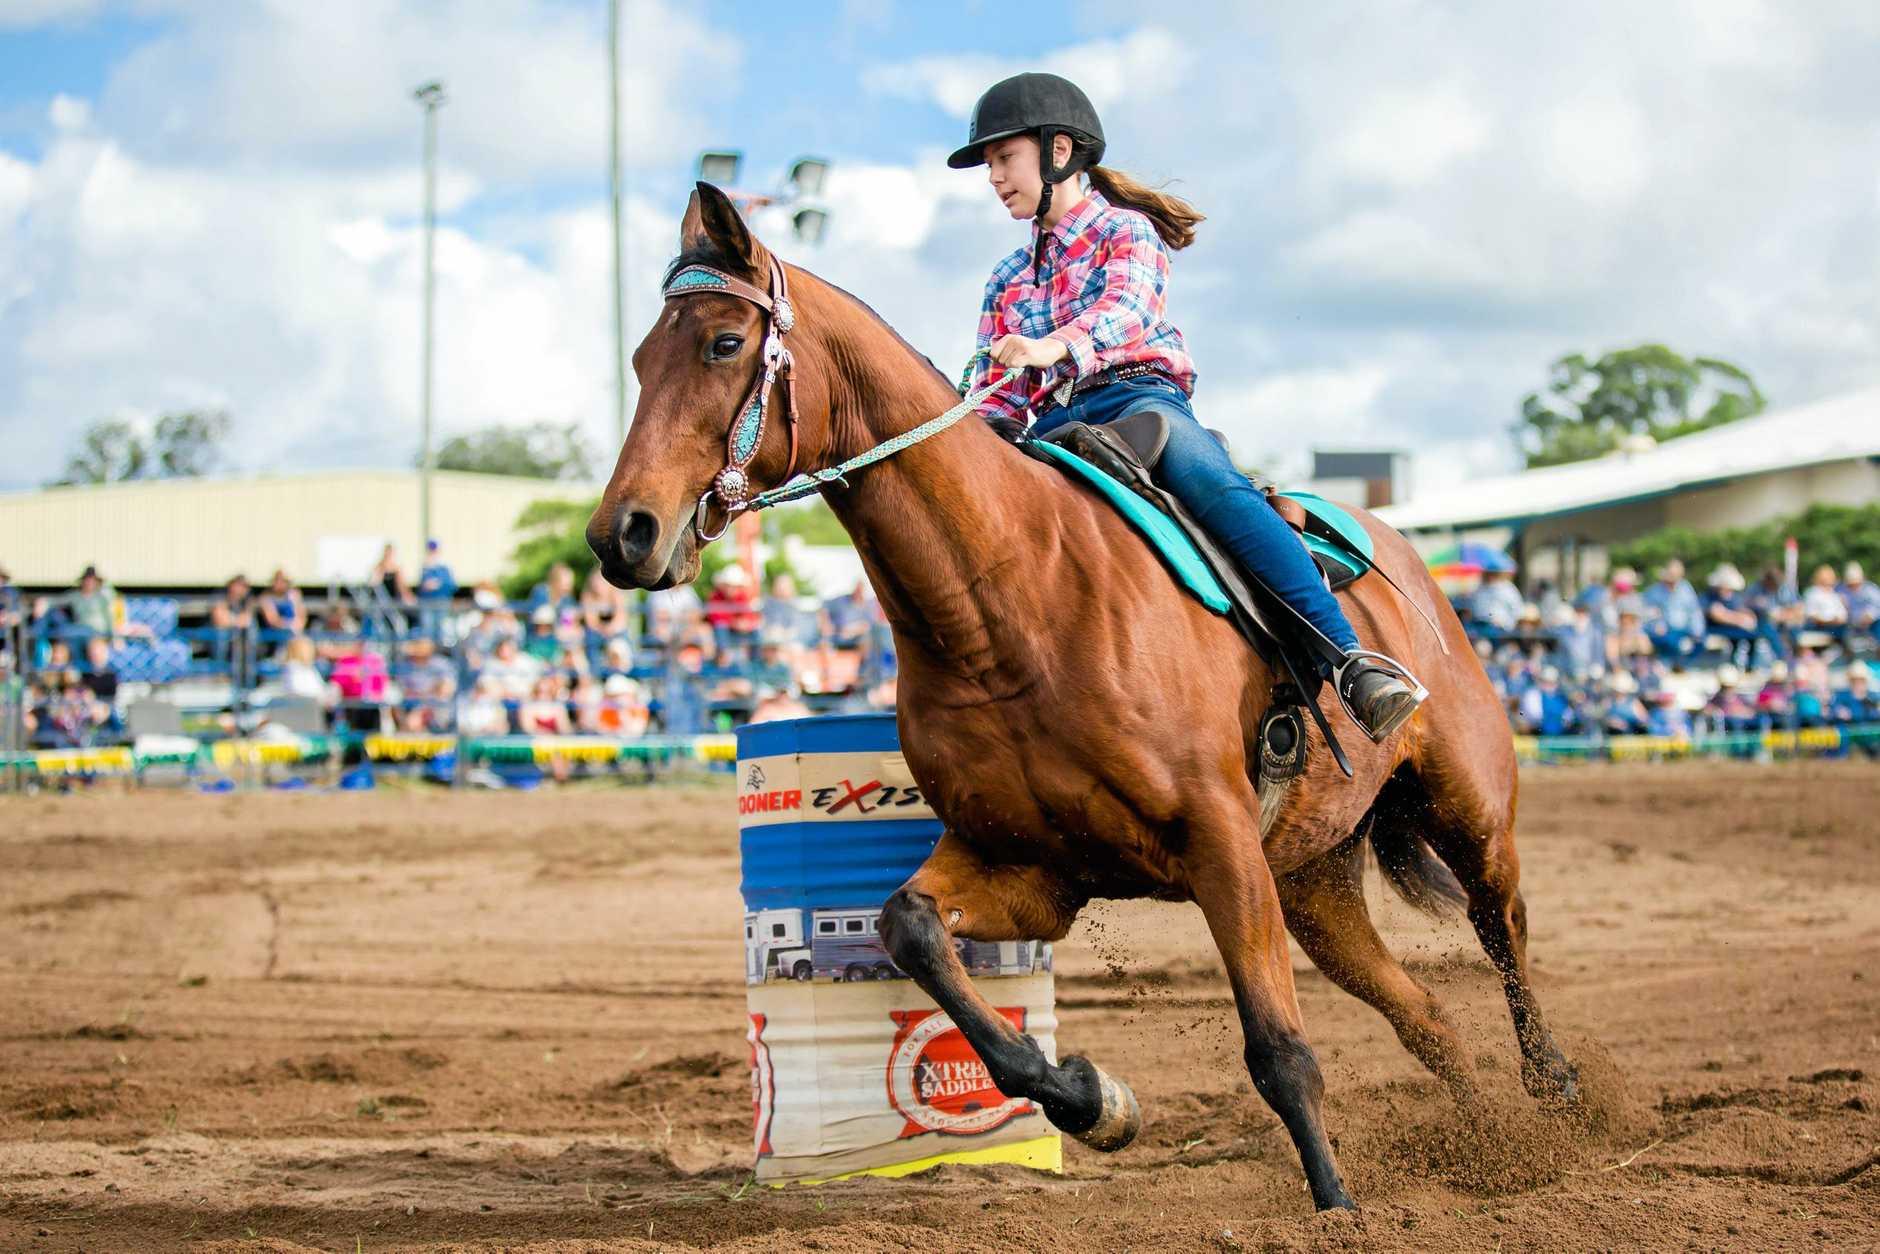 Gympie Show Rodeo - Hayley Millard U/18 Junior Barrel Race